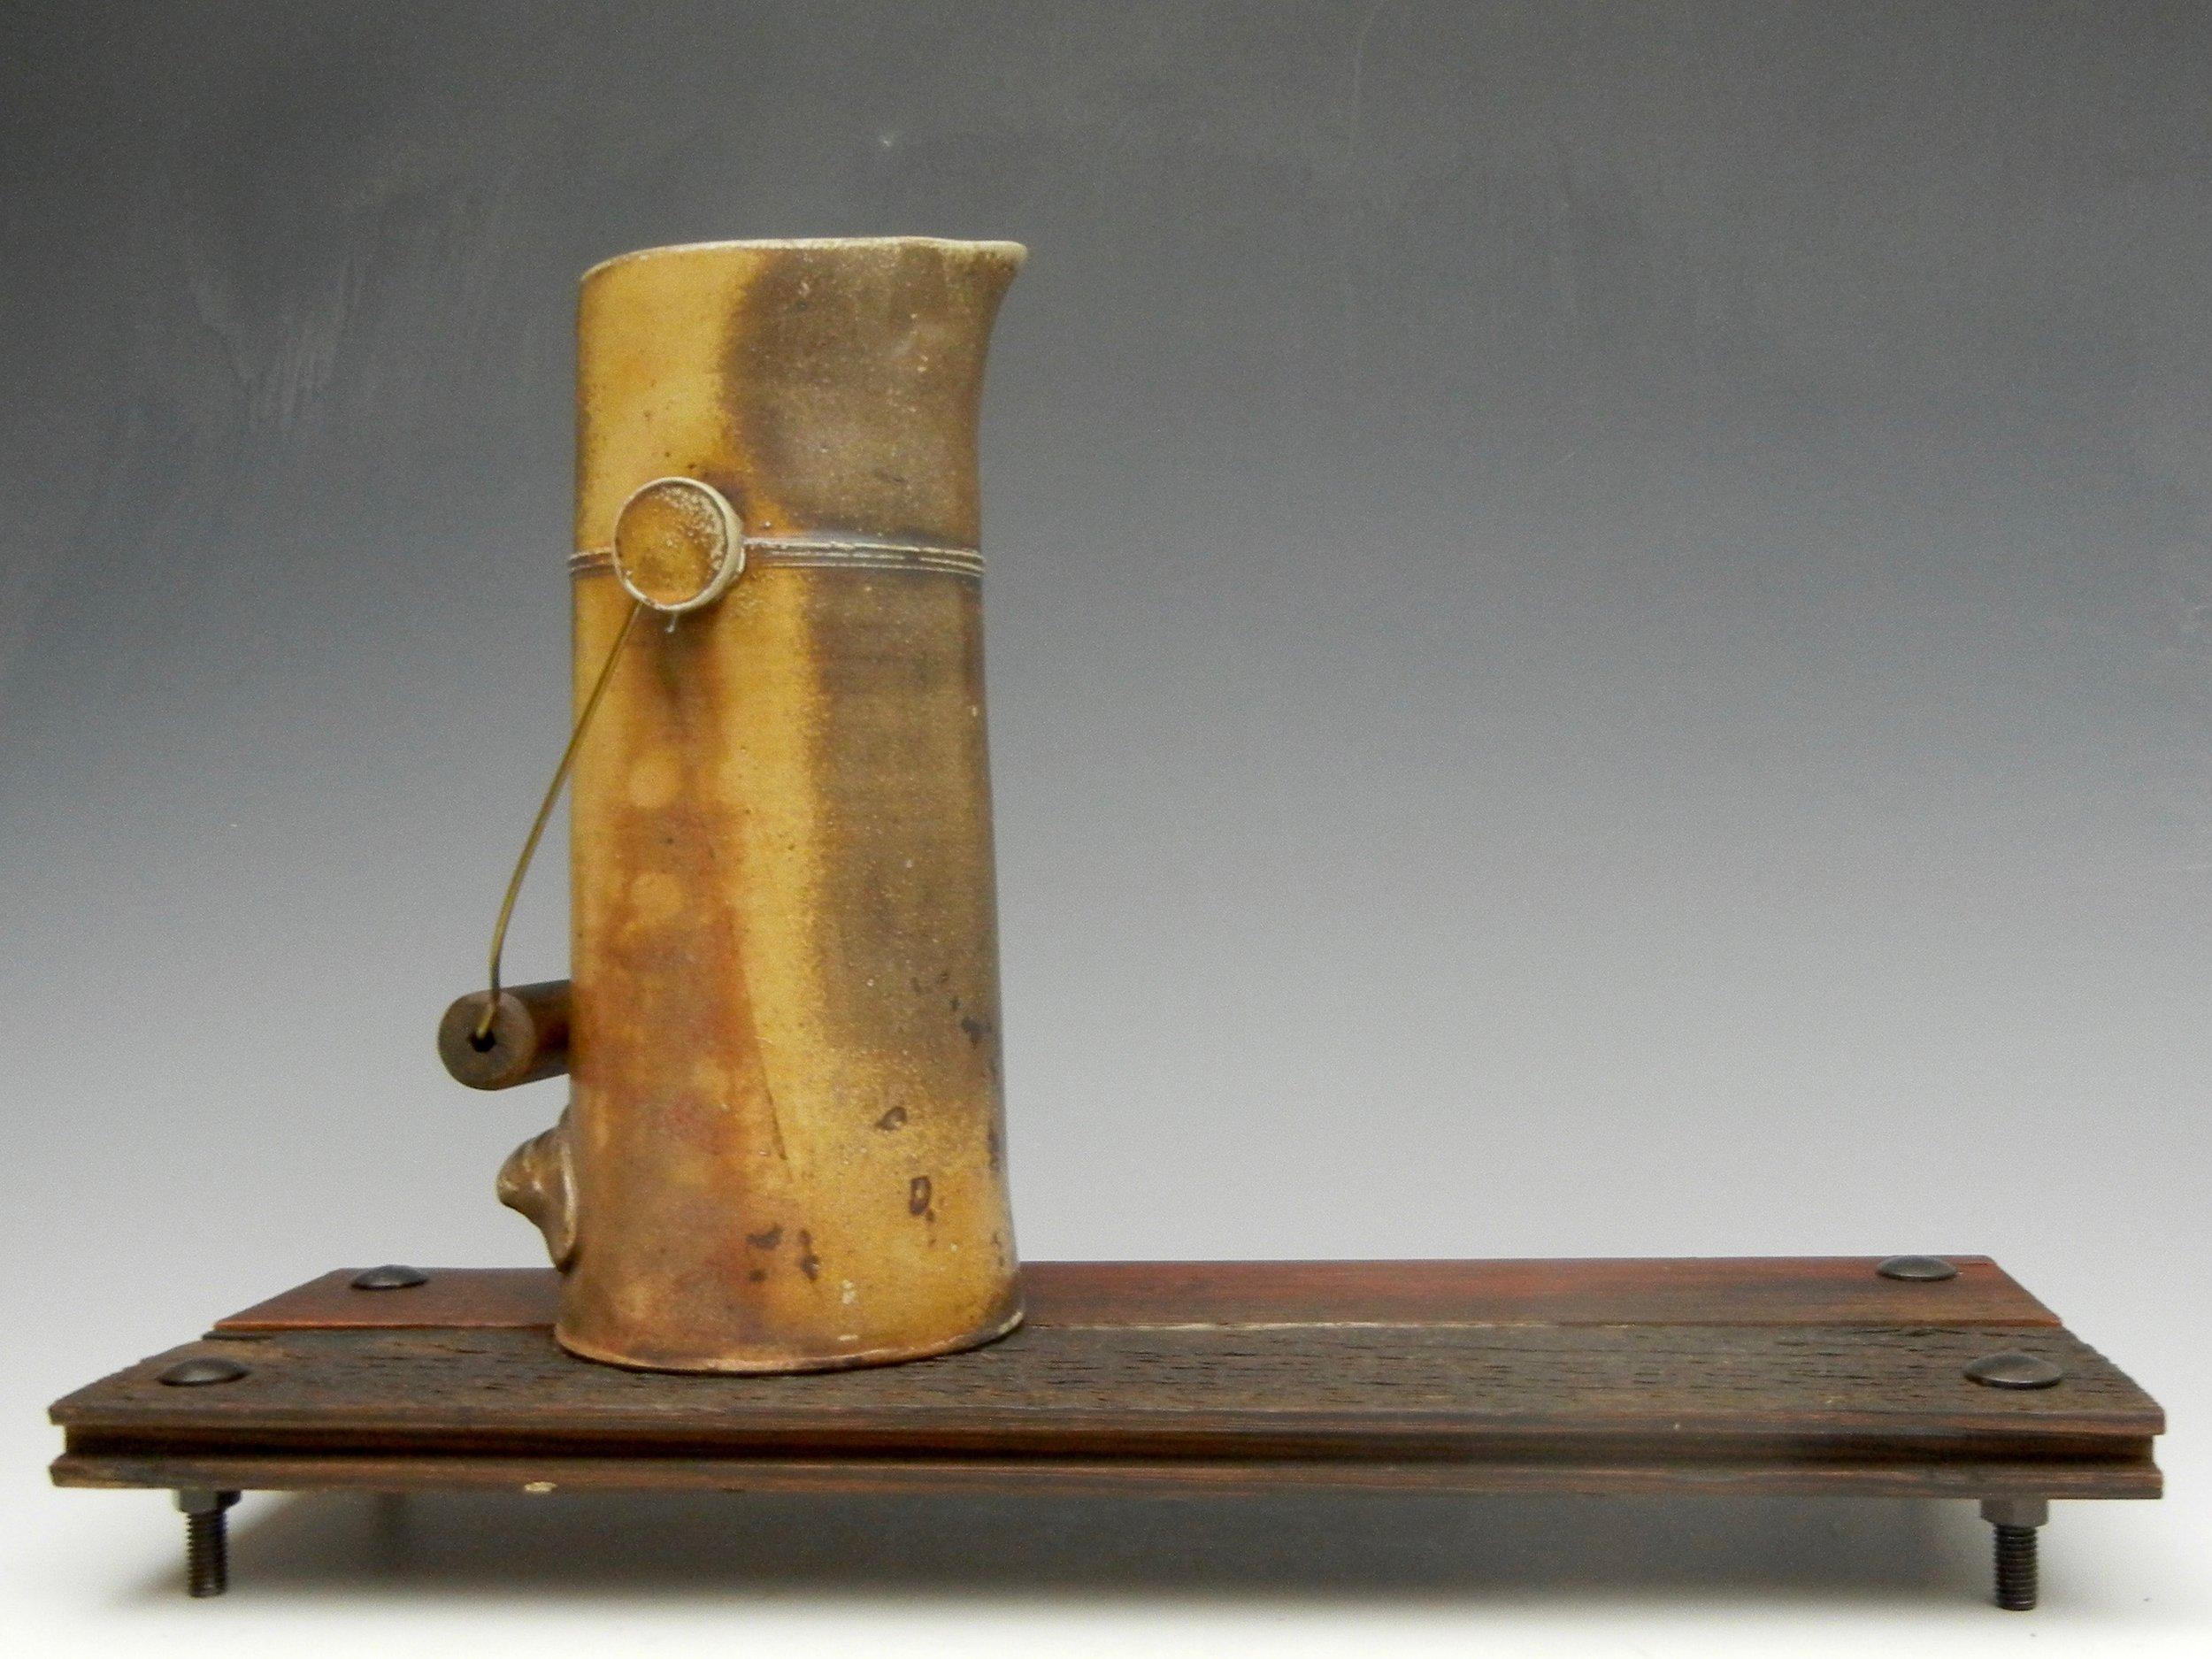 Lorenz Pottery, handmade, ceramics, pottery, folk pottery, wood fired, soda fired, pitcher